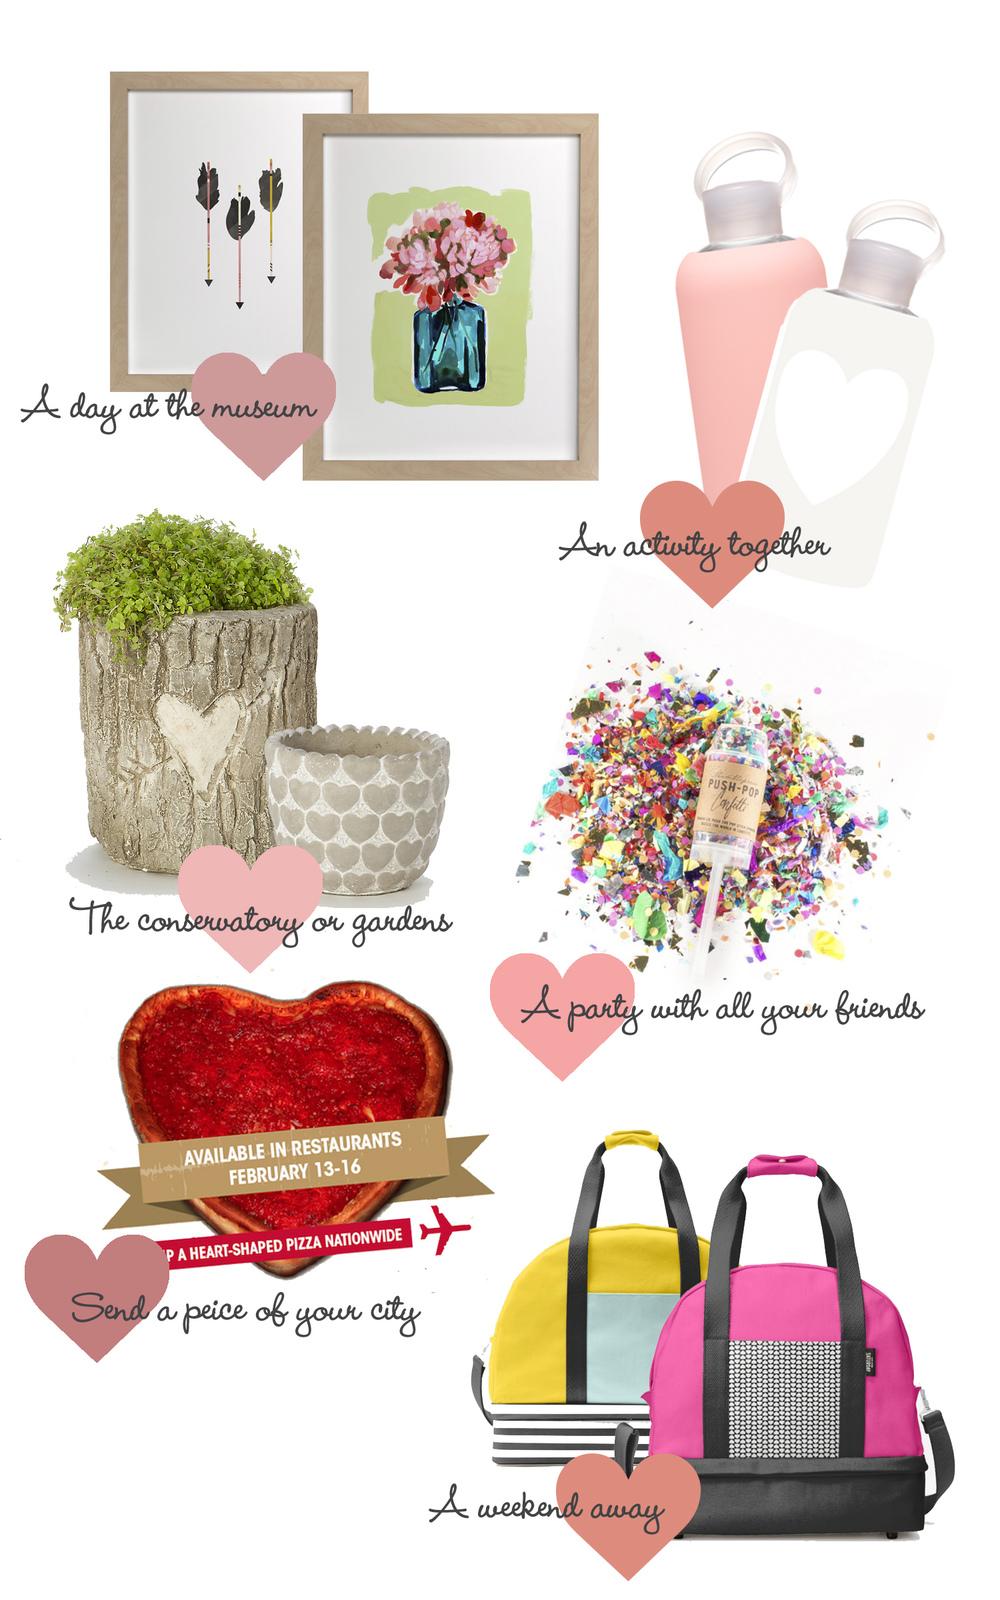 ValentinesDayActivities.jpg